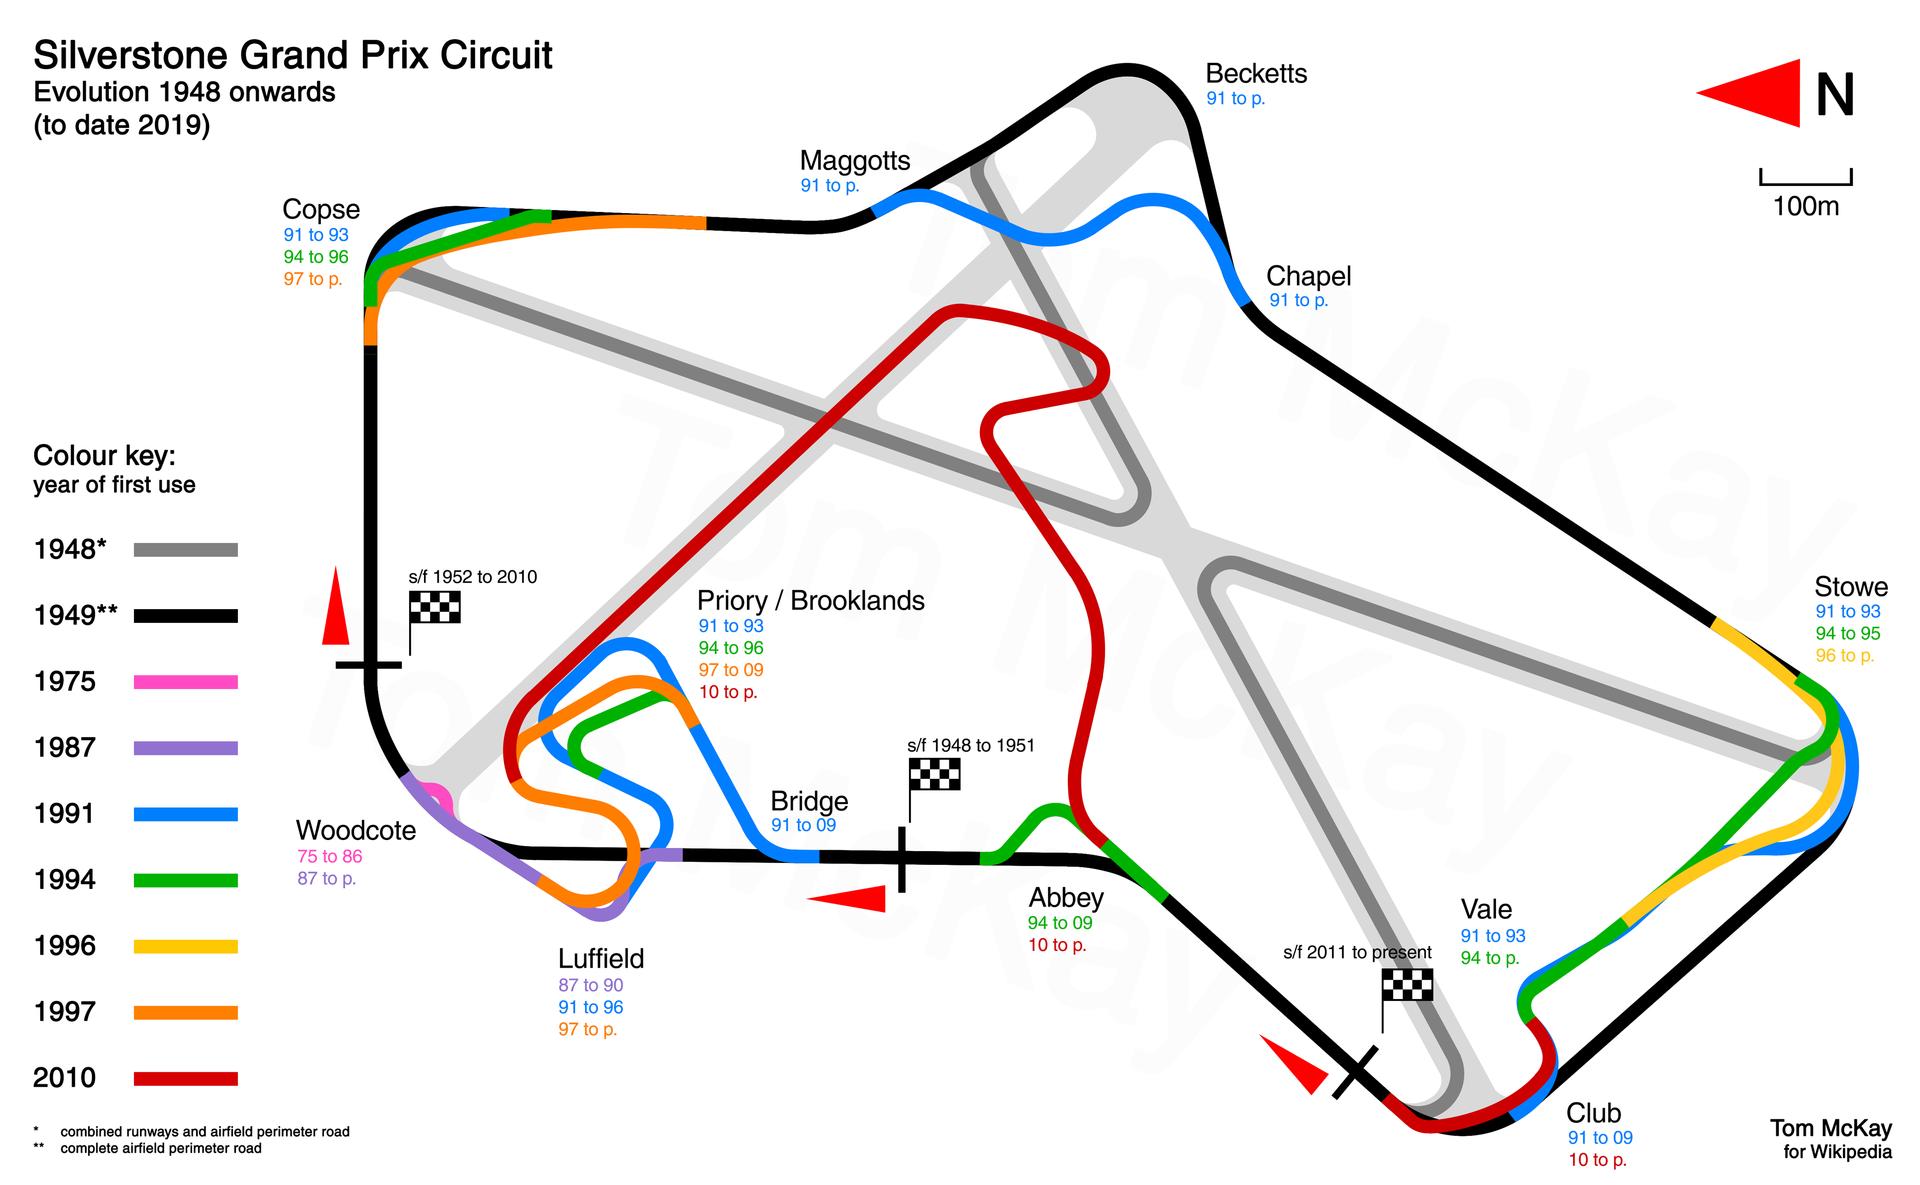 https://upload.wikimedia.org/wikipedia/commons/thumb/d/d3/Evolution_of_Silverstone_Grand_Prix_Circuit_1949_to_present.png/1920px-Evolution_of_Silverstone_Grand_Prix_Circuit_1949_to_present.png